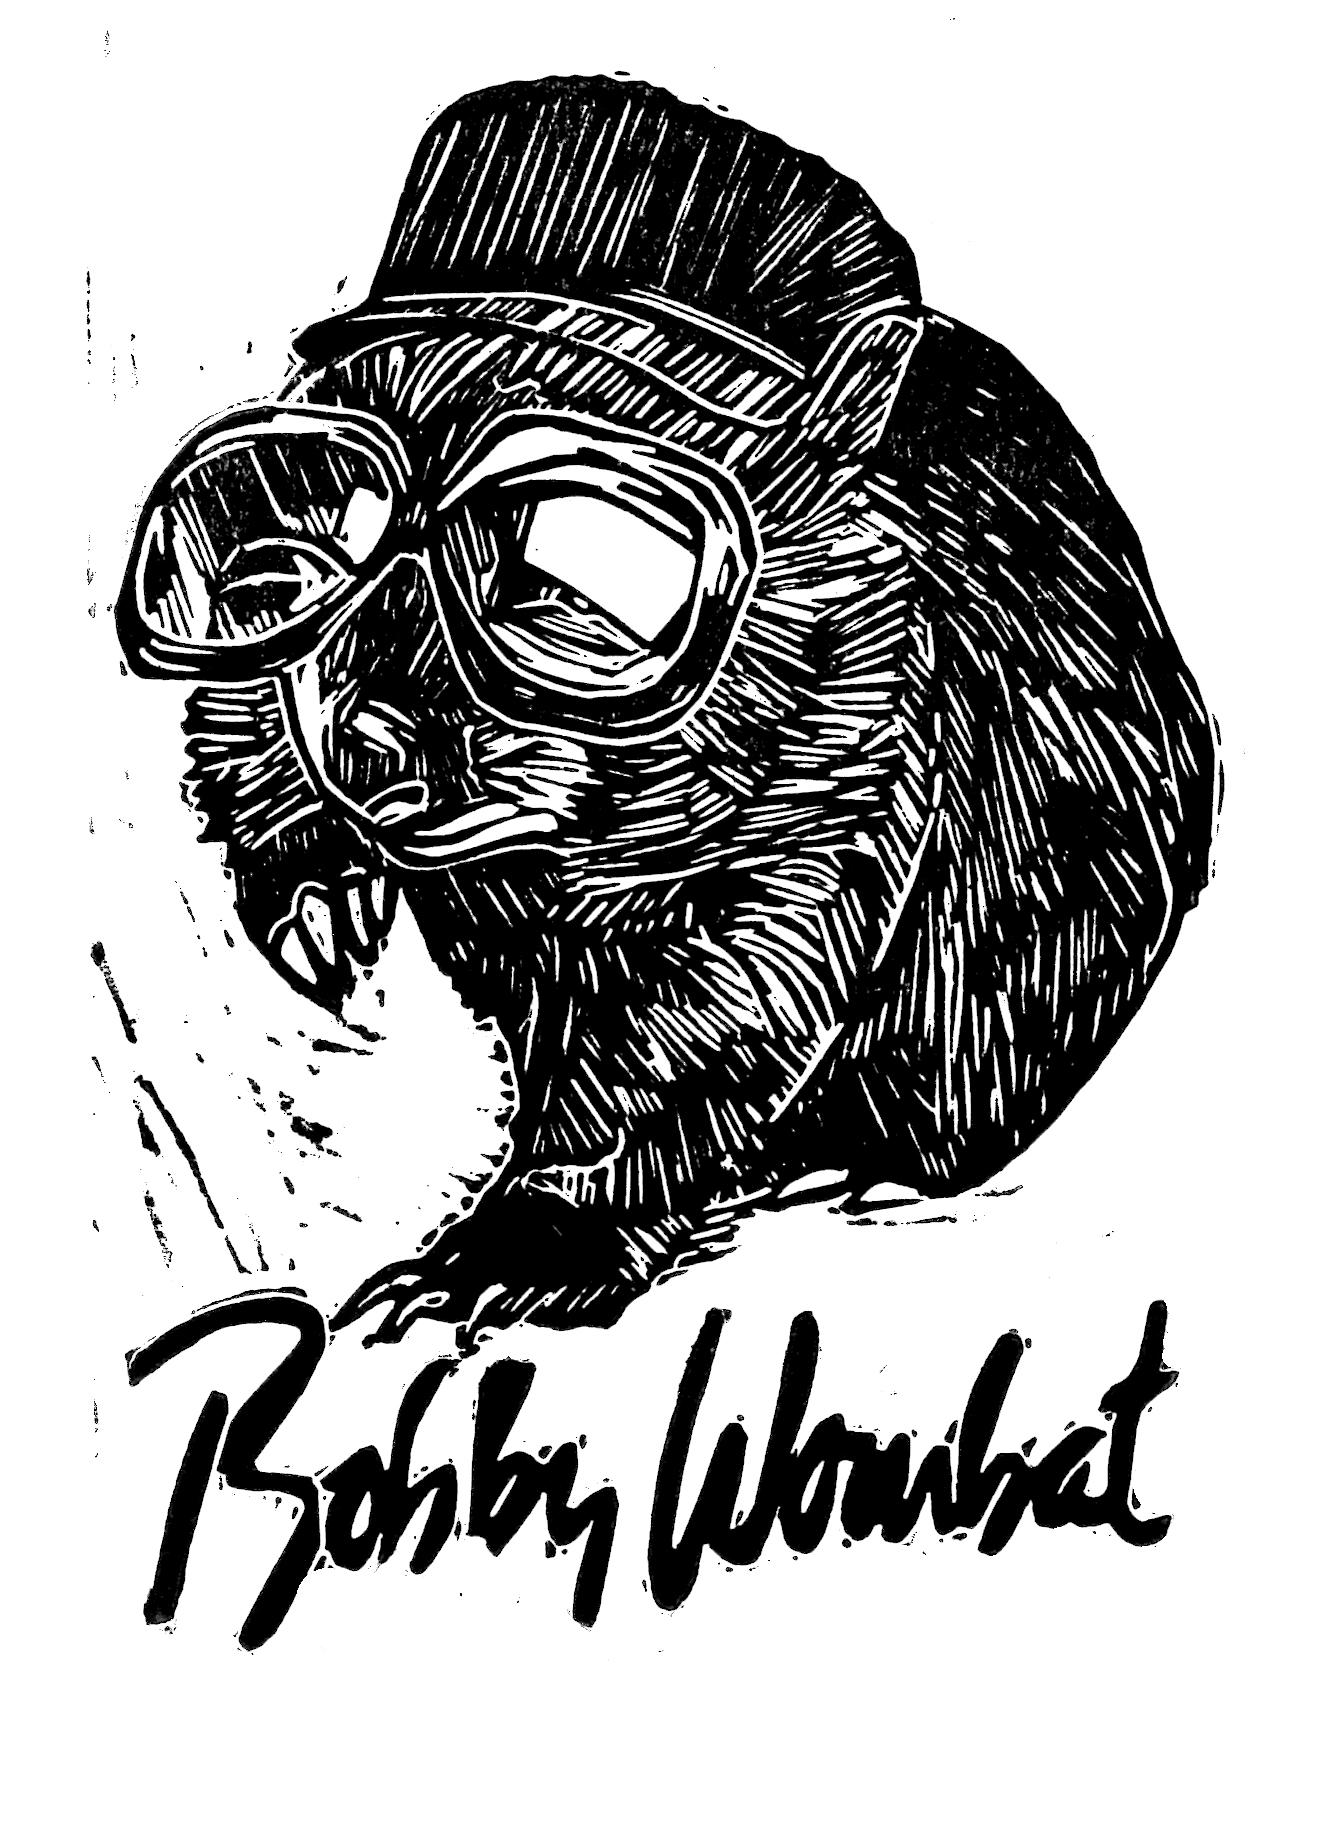 Bobby Wombat